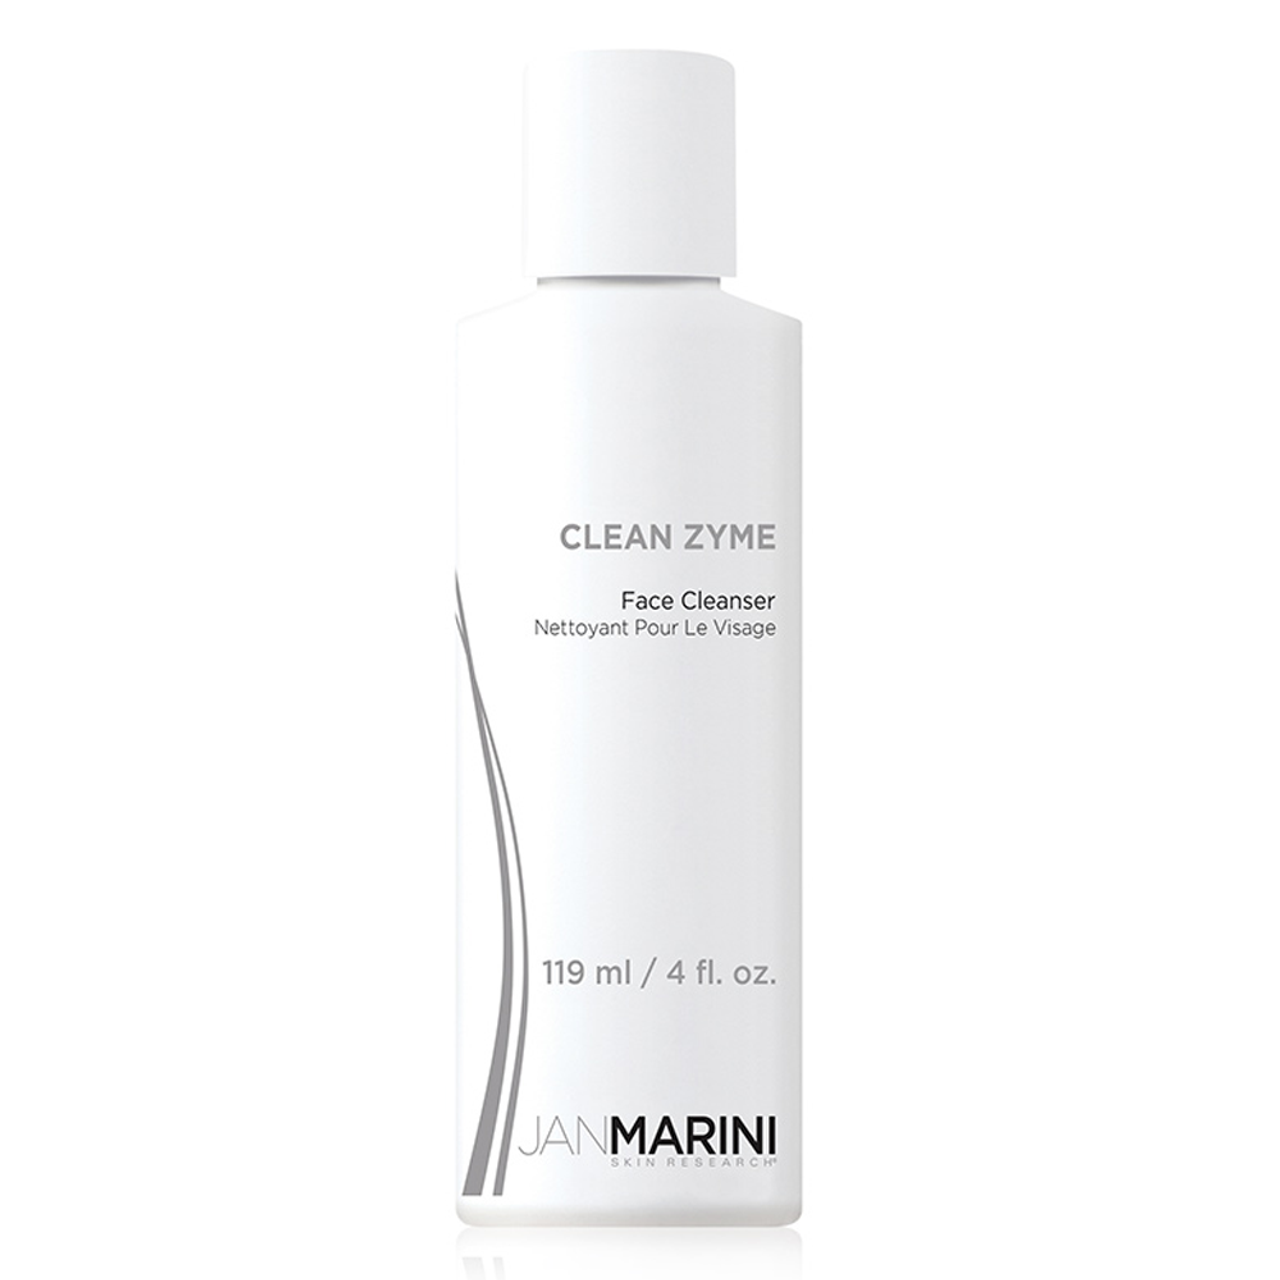 Jan Marini Clean Zyme Cleanser